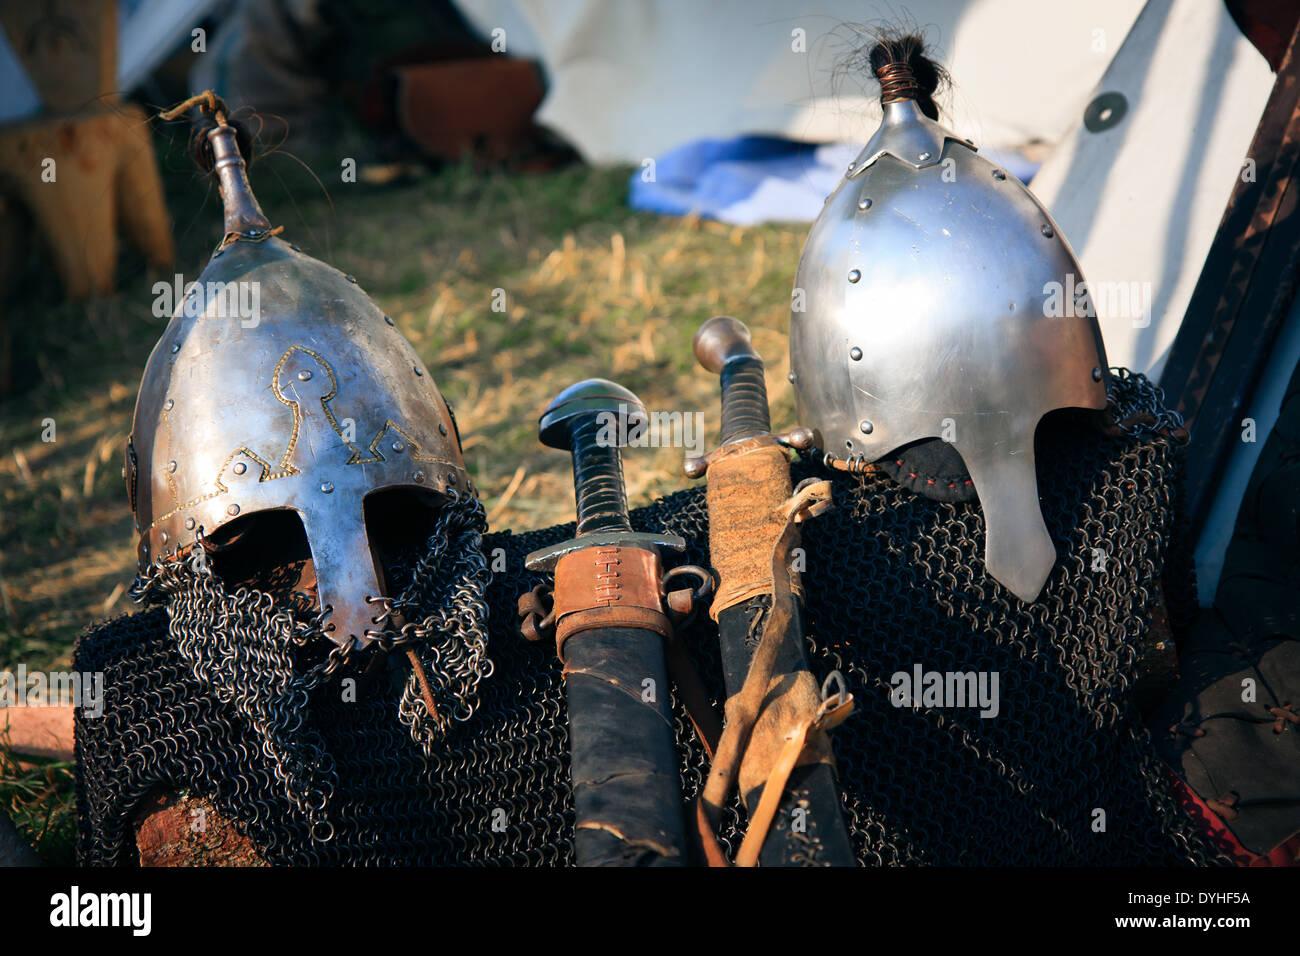 Spectacle viking helmets - Stock Image